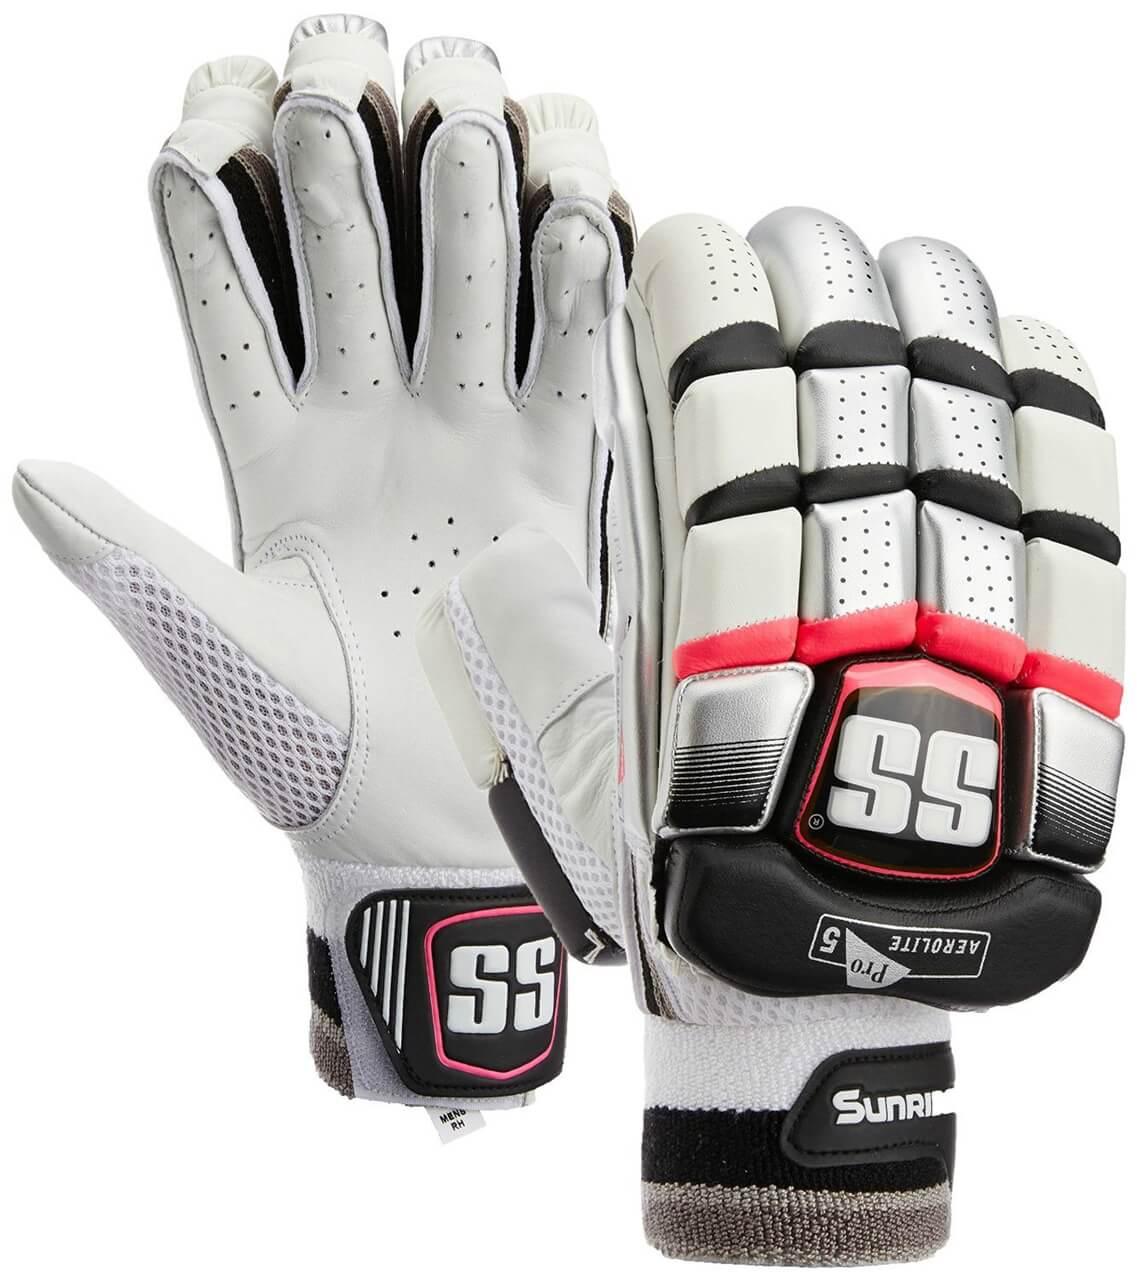 SS Cricket Batting Gloves Aerolite Pro 5 By Sunridges